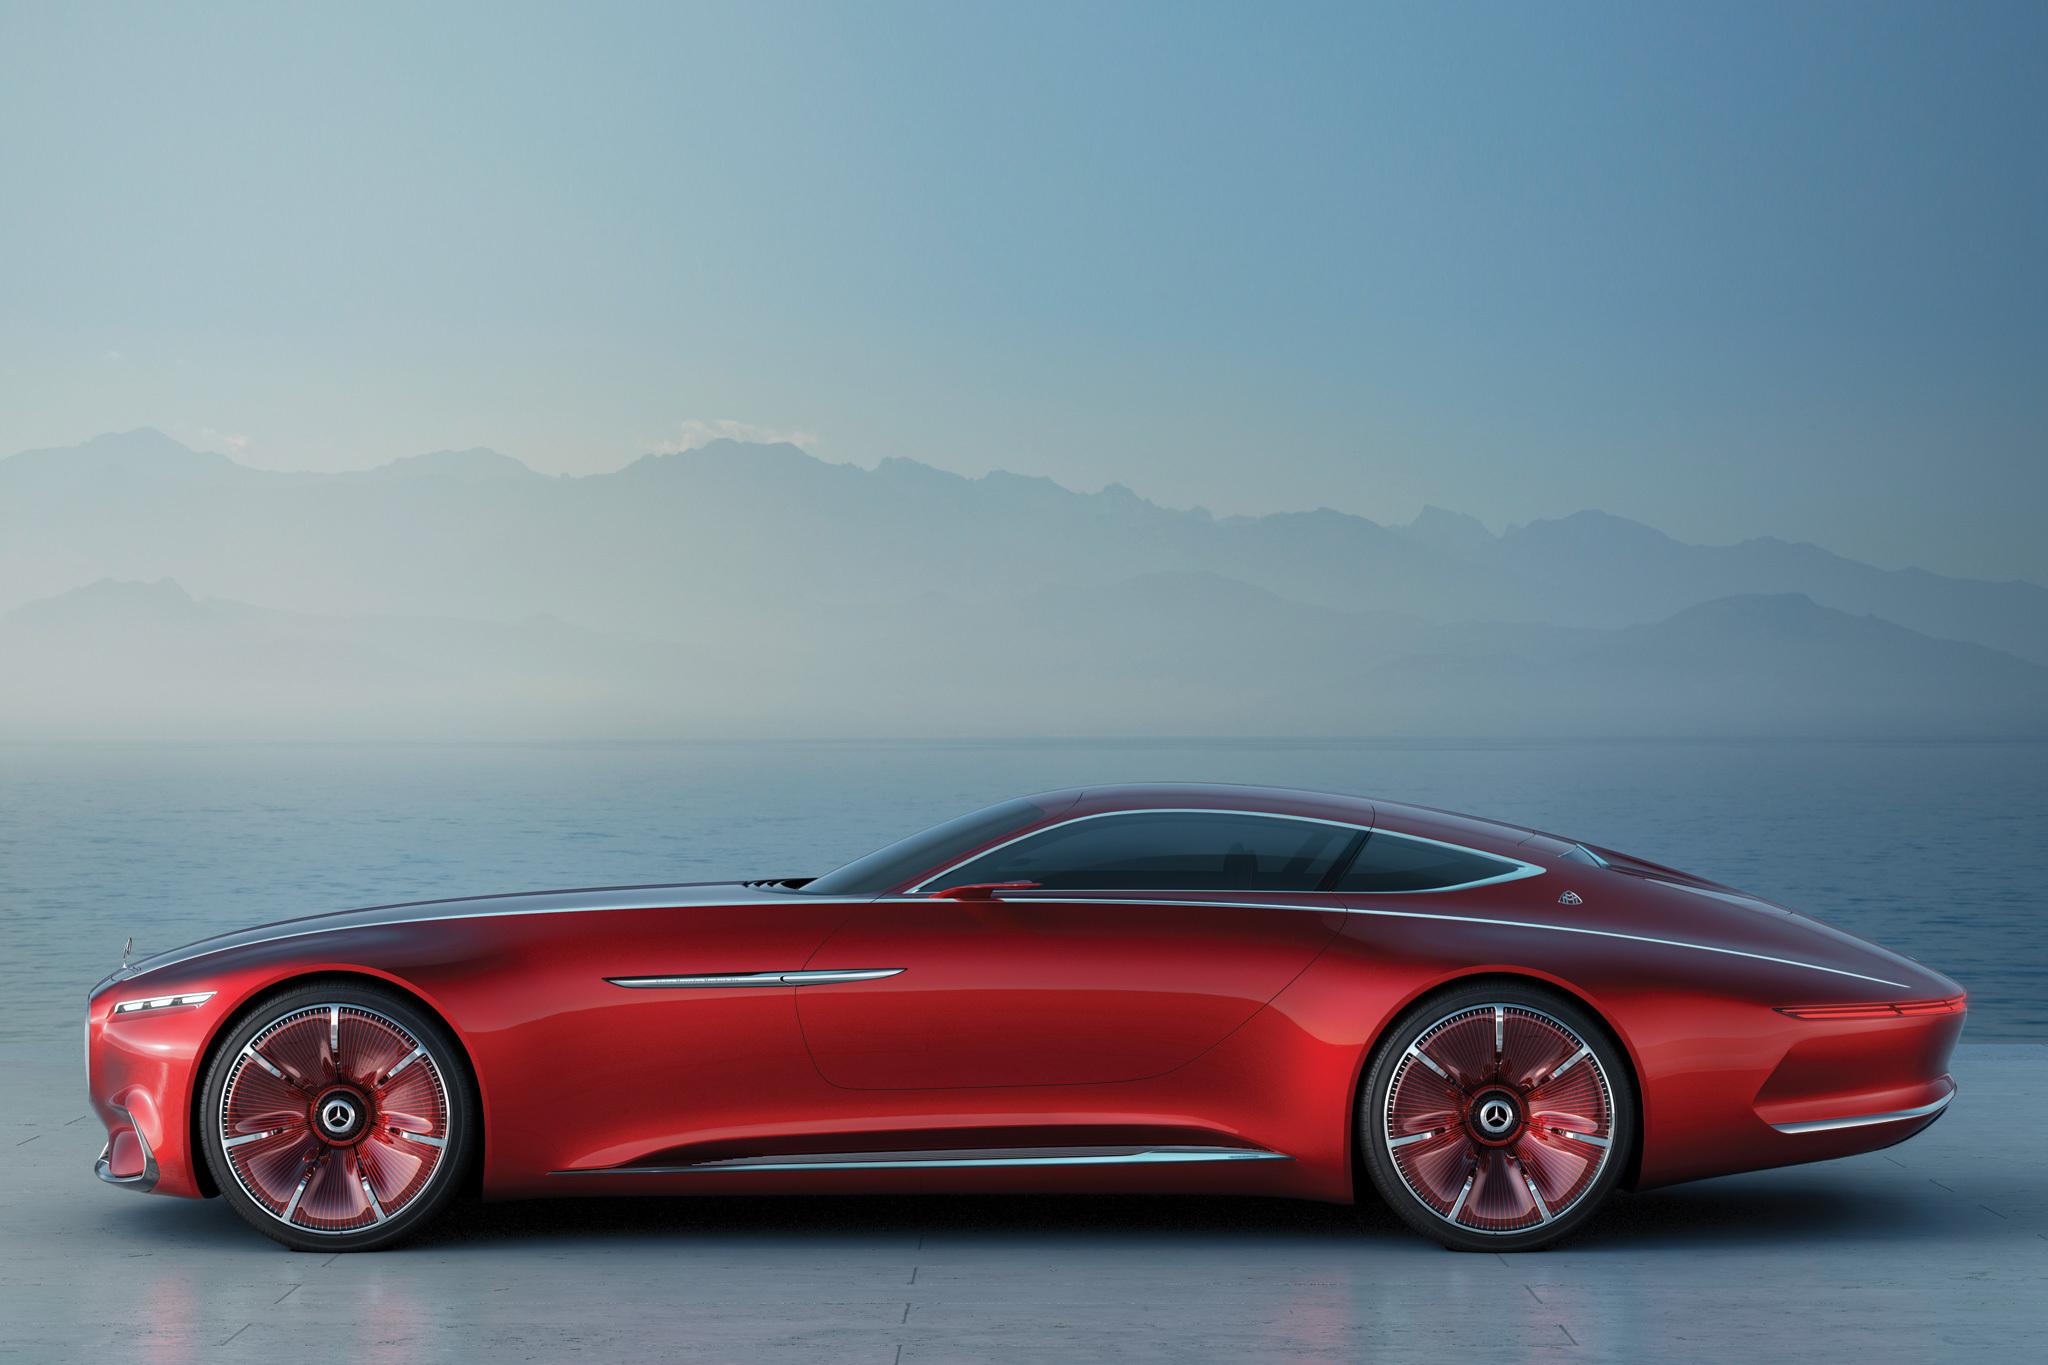 Картинка: Vision, Mercedes-Maybach 6, Mercedes, концепт, электродвигатель, красный, туман, море, горы